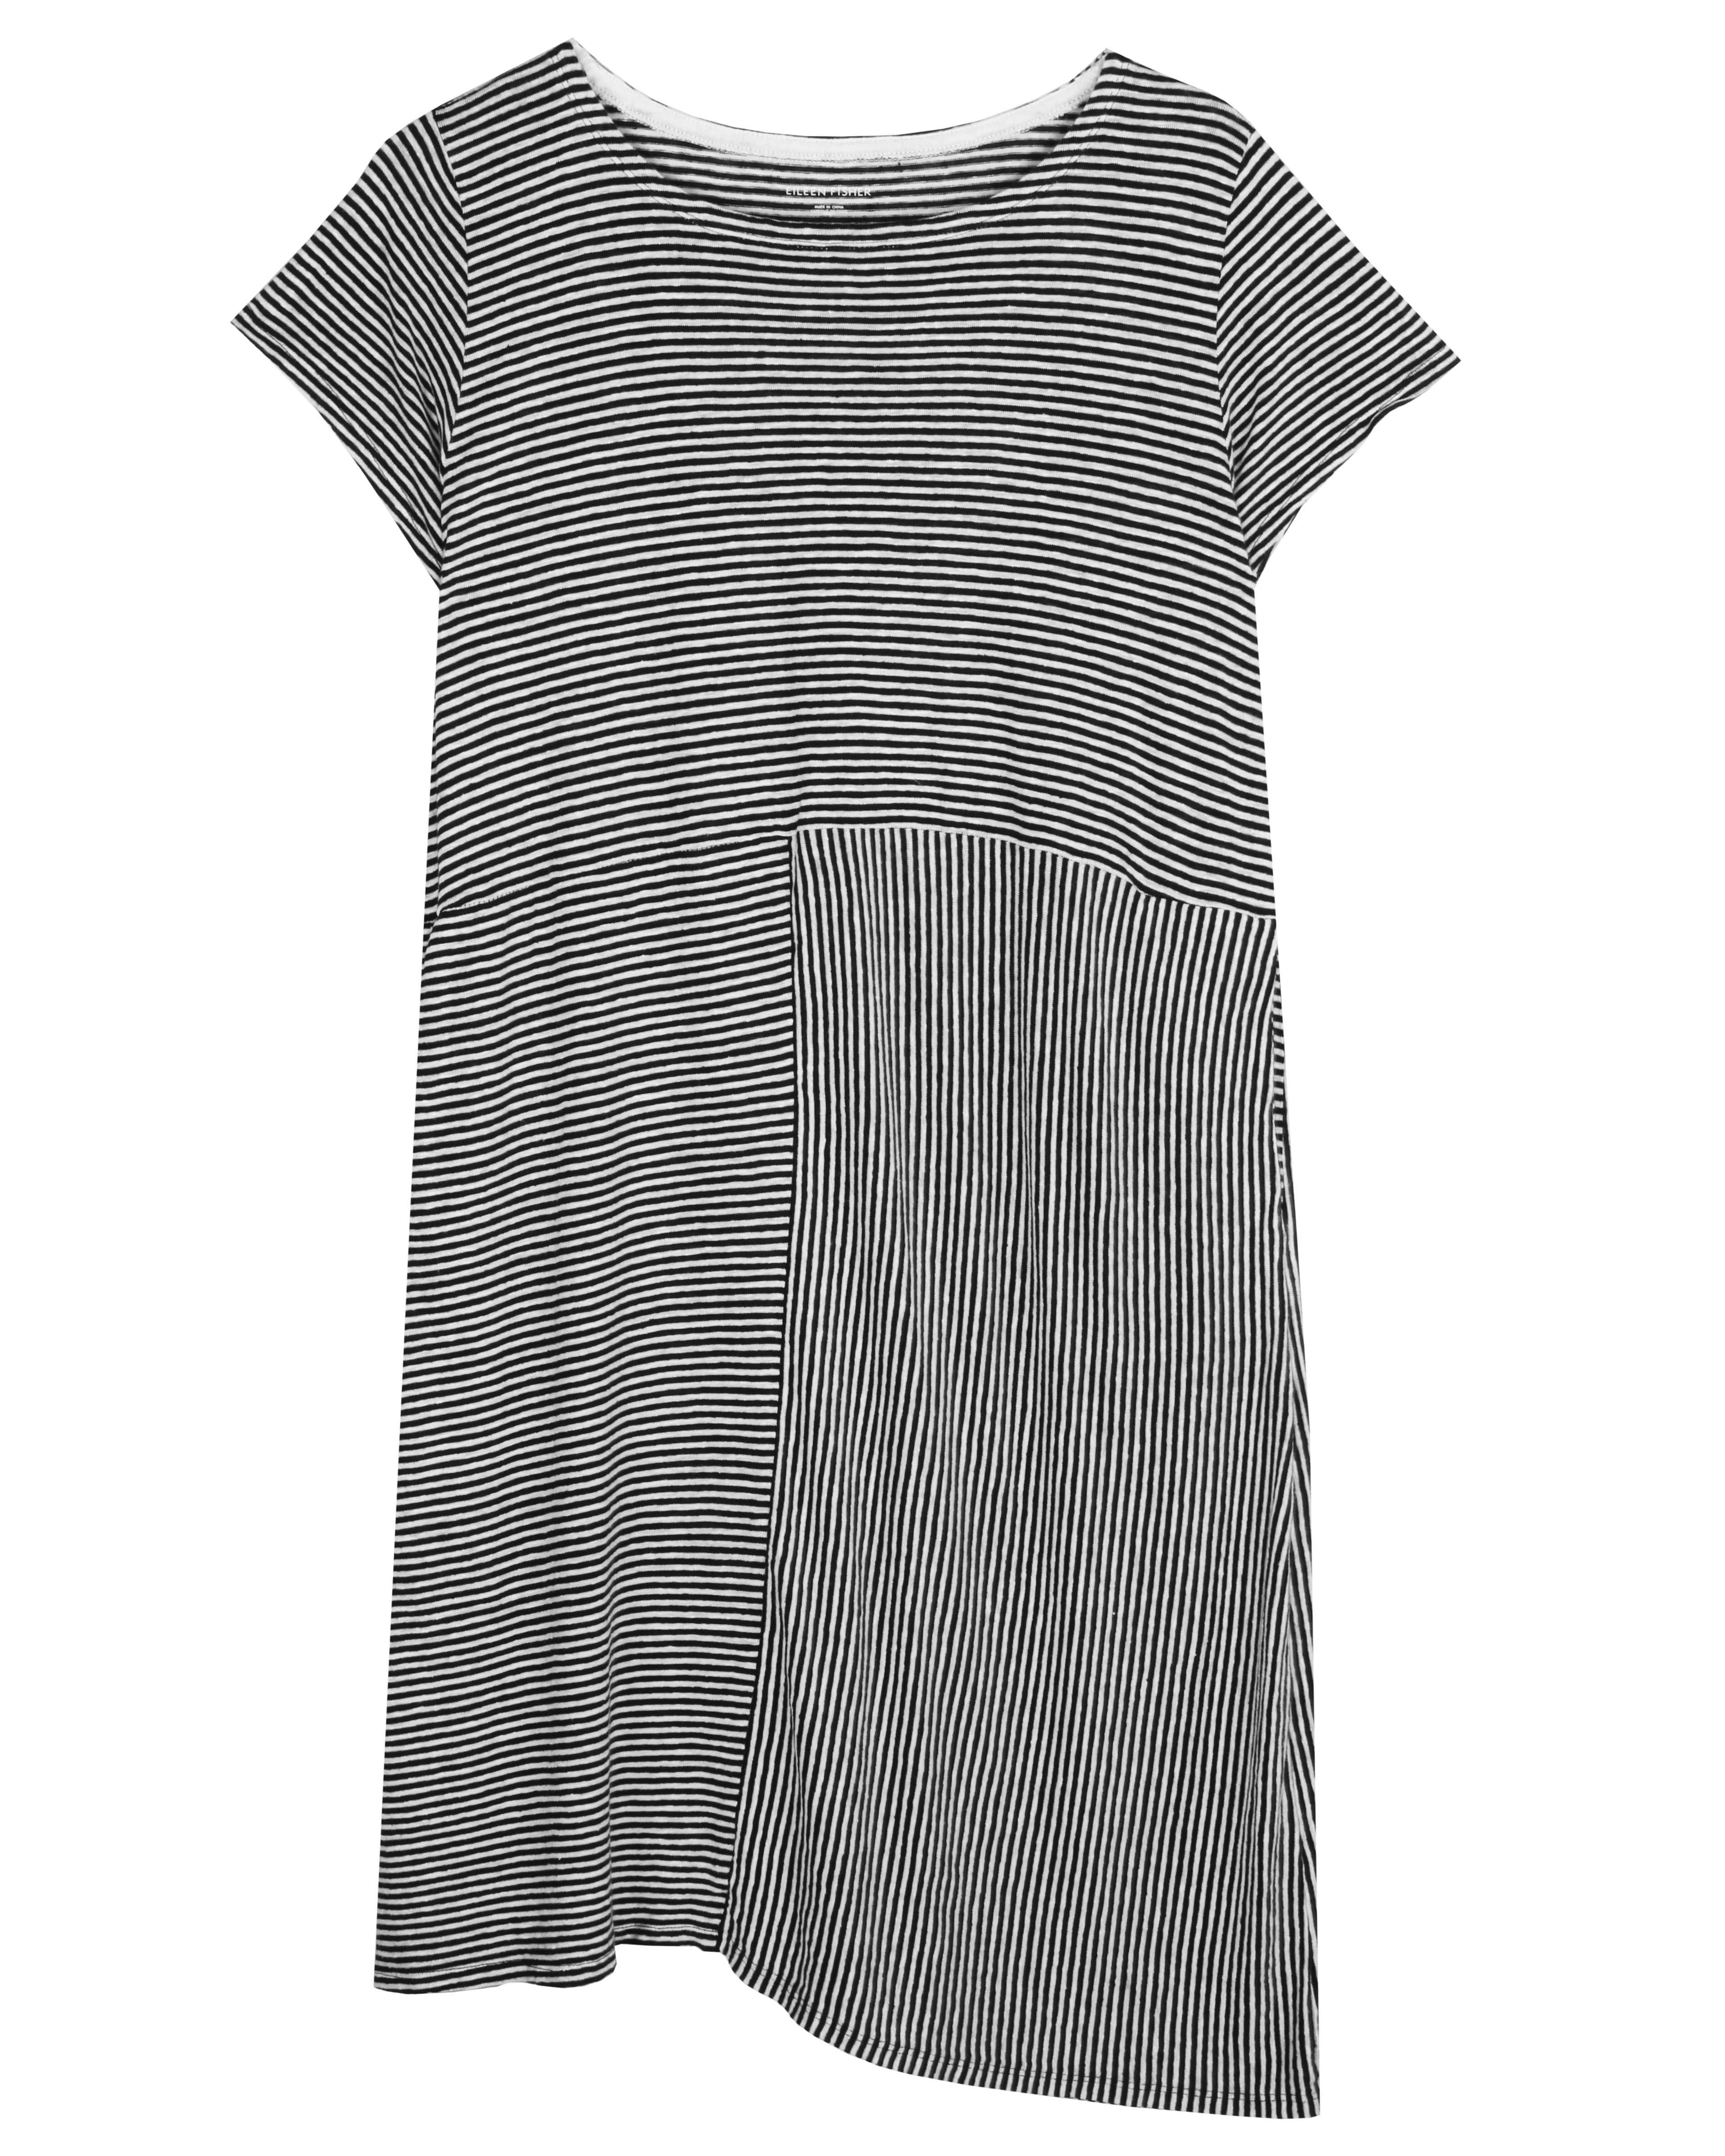 70e9dce988 Used Organic Linen Jersey Stripe Dress Print pattern